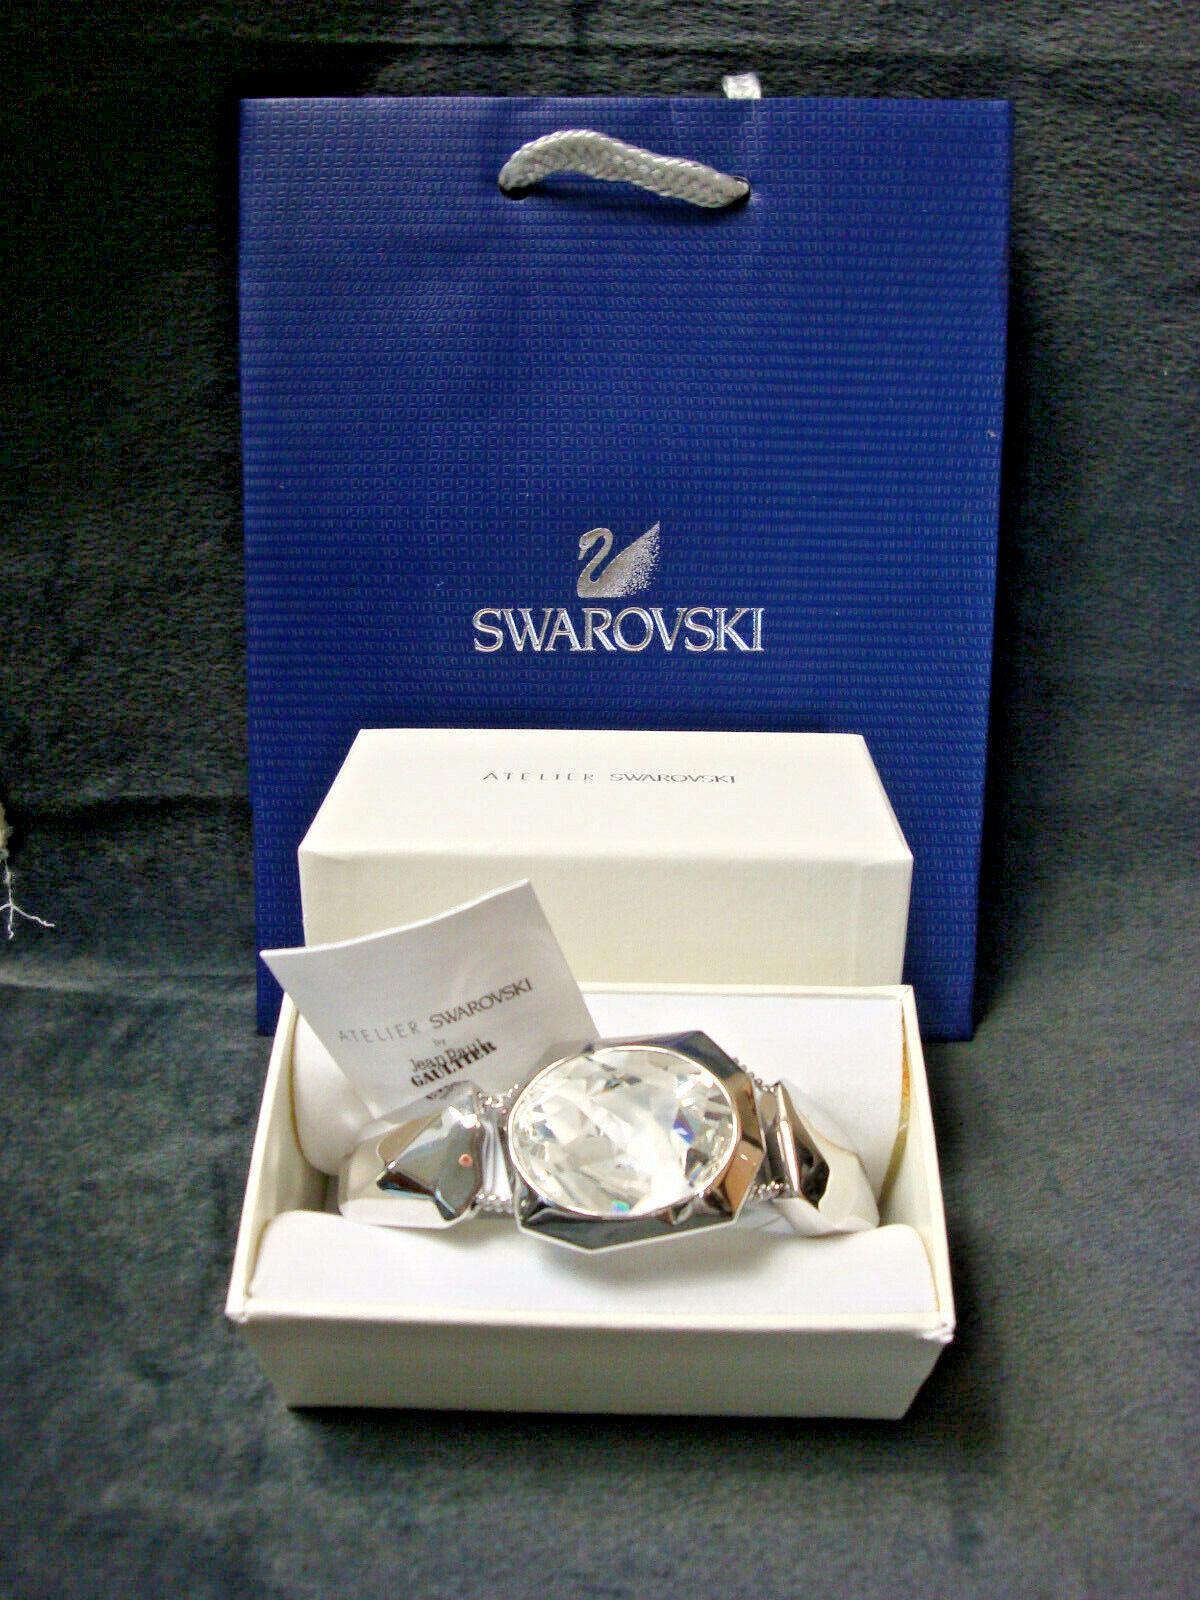 JEAN PAUL GAULTIER ATELIER SWAROVSKI Reverese Crystal Bracelet NEW IN BOX